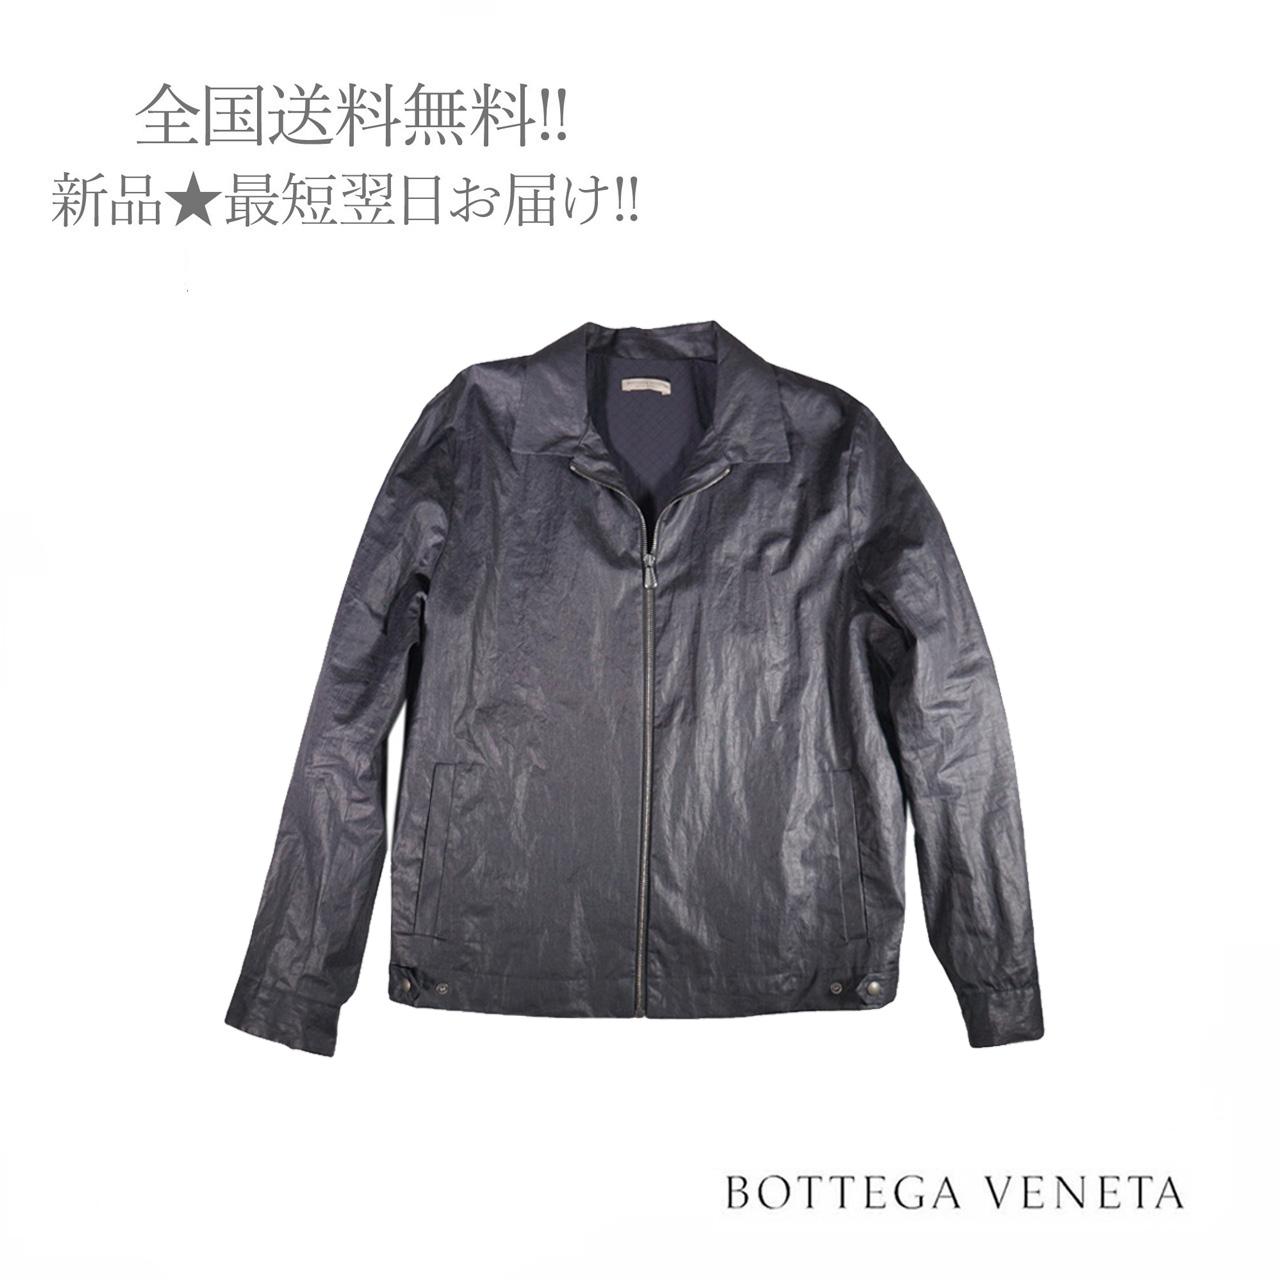 BOTTEGA VENETA ボッテガ 特価キャンペーン ヴェネタ ブルゾン 爆買い新作 レザー リネン 新品 メンズ 4030 男 50 ダークネイビー